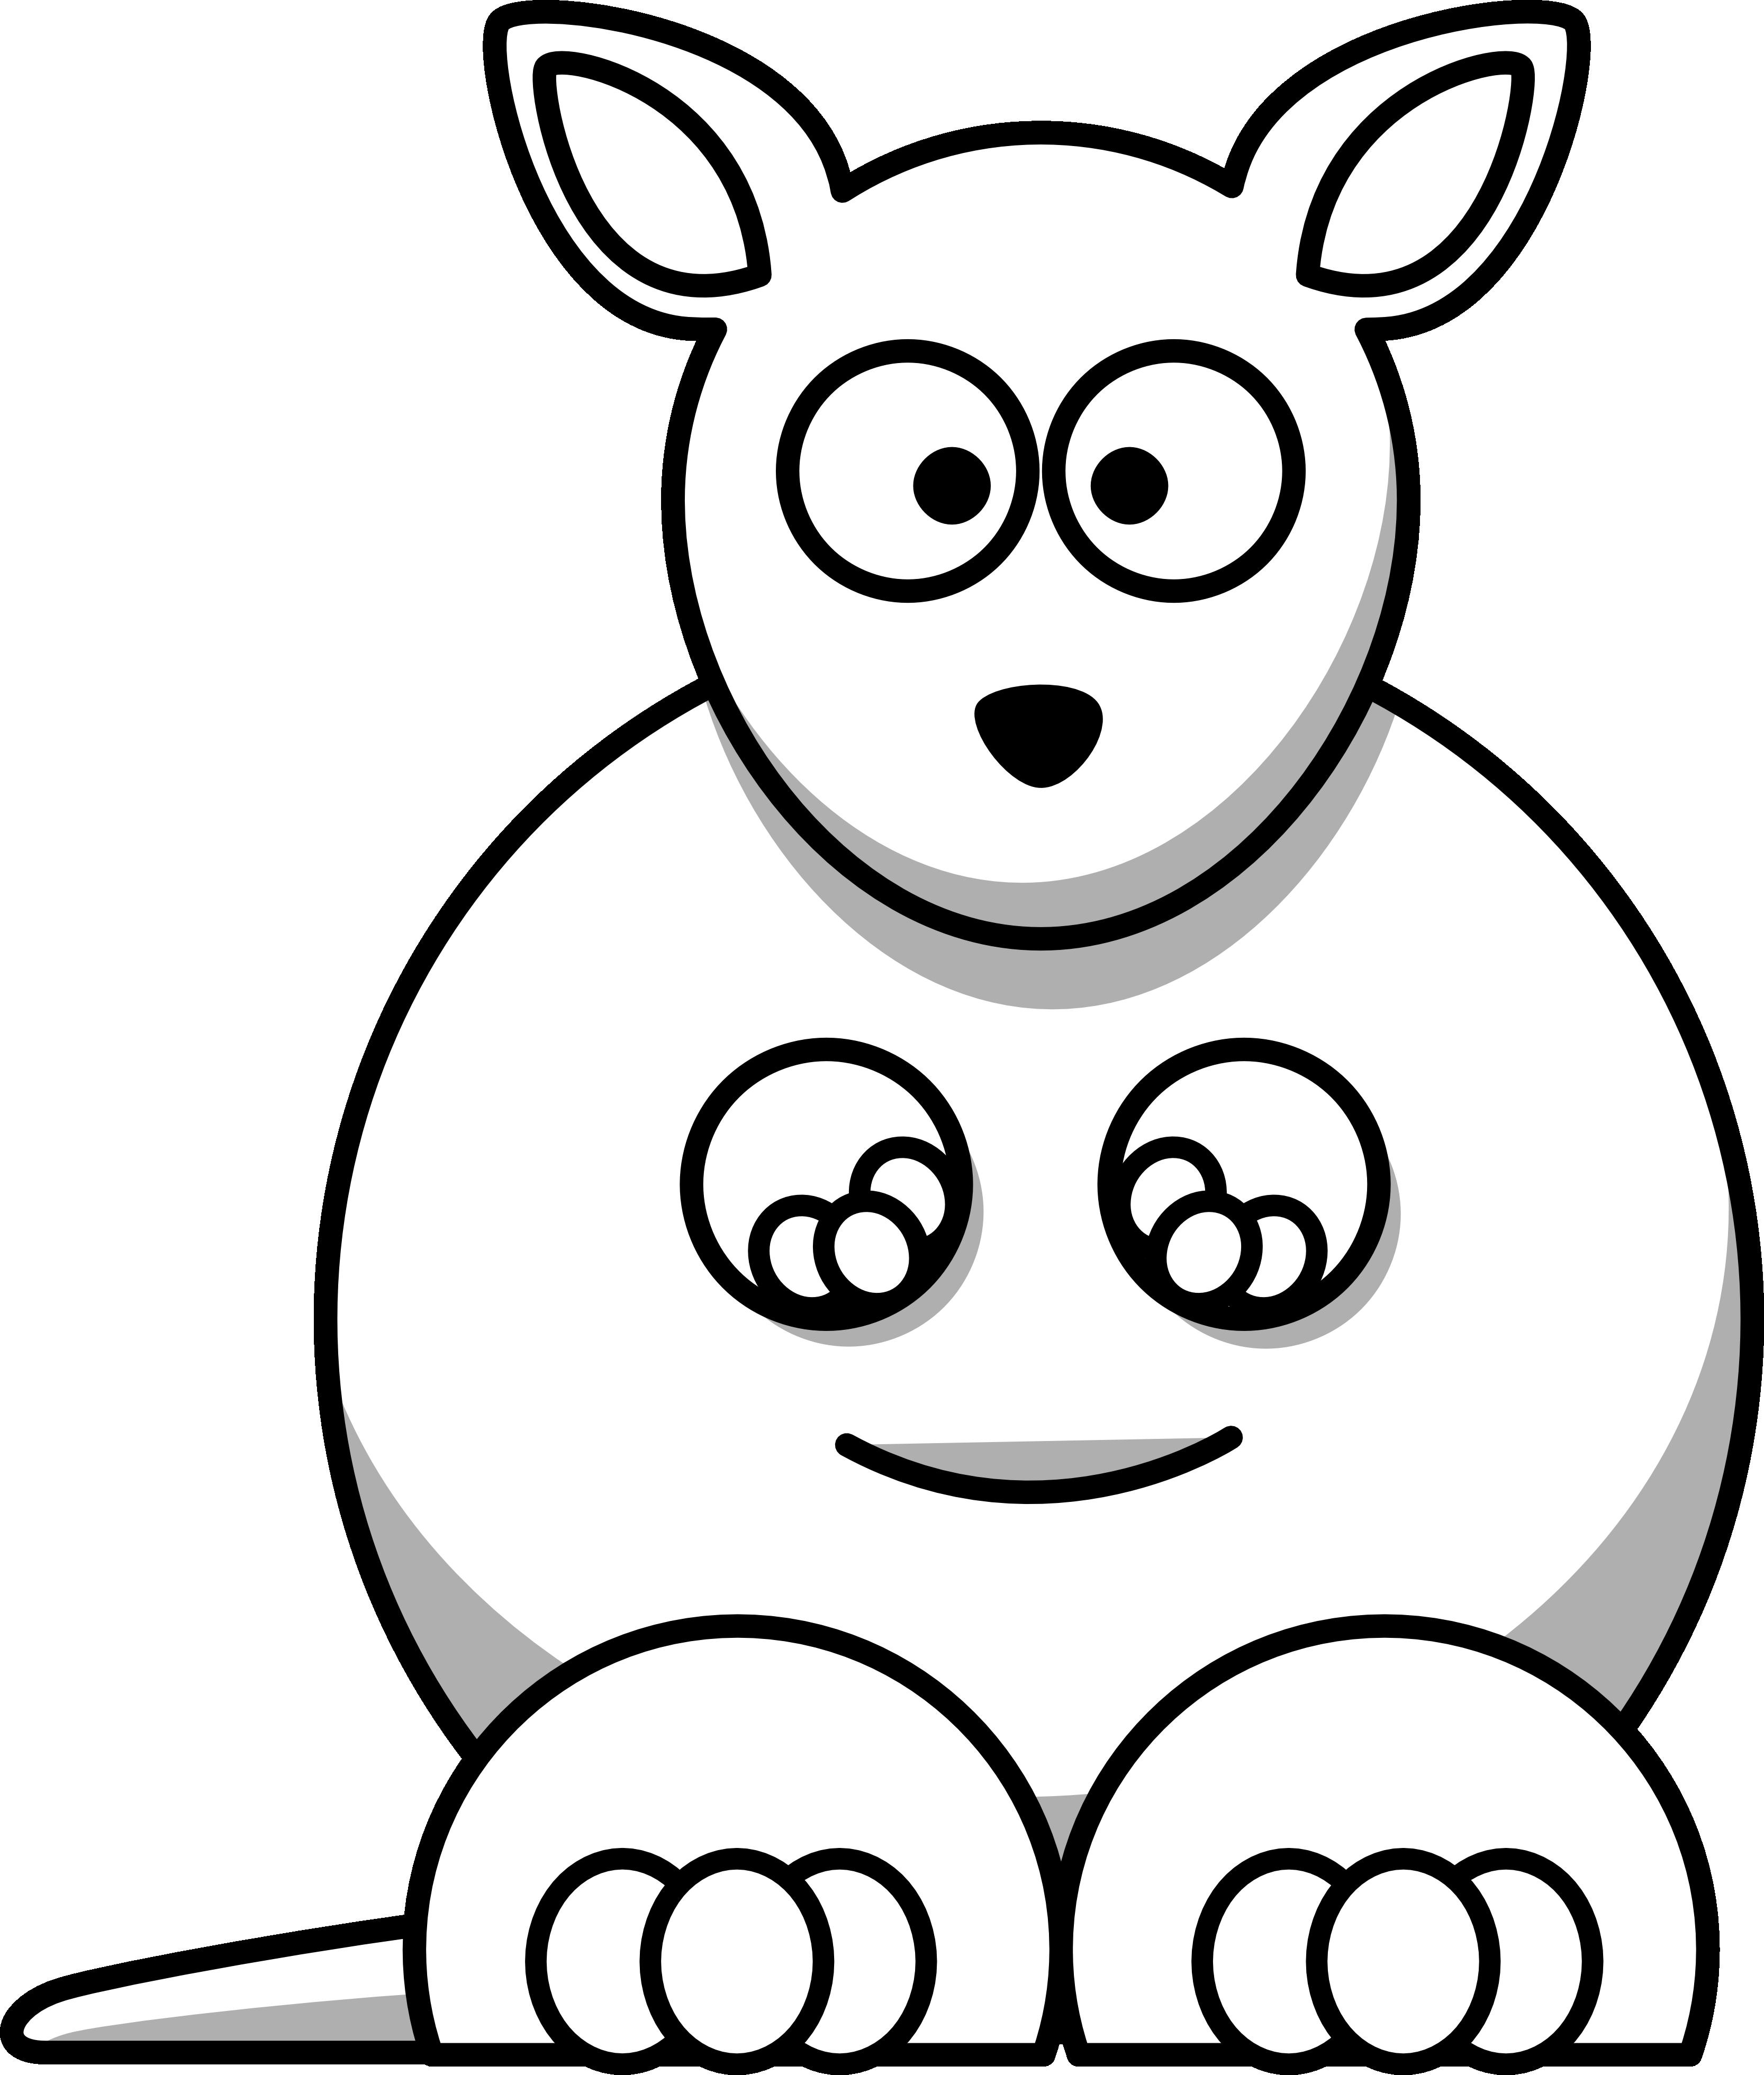 kangaroo%20clipart%20black%20and%20white